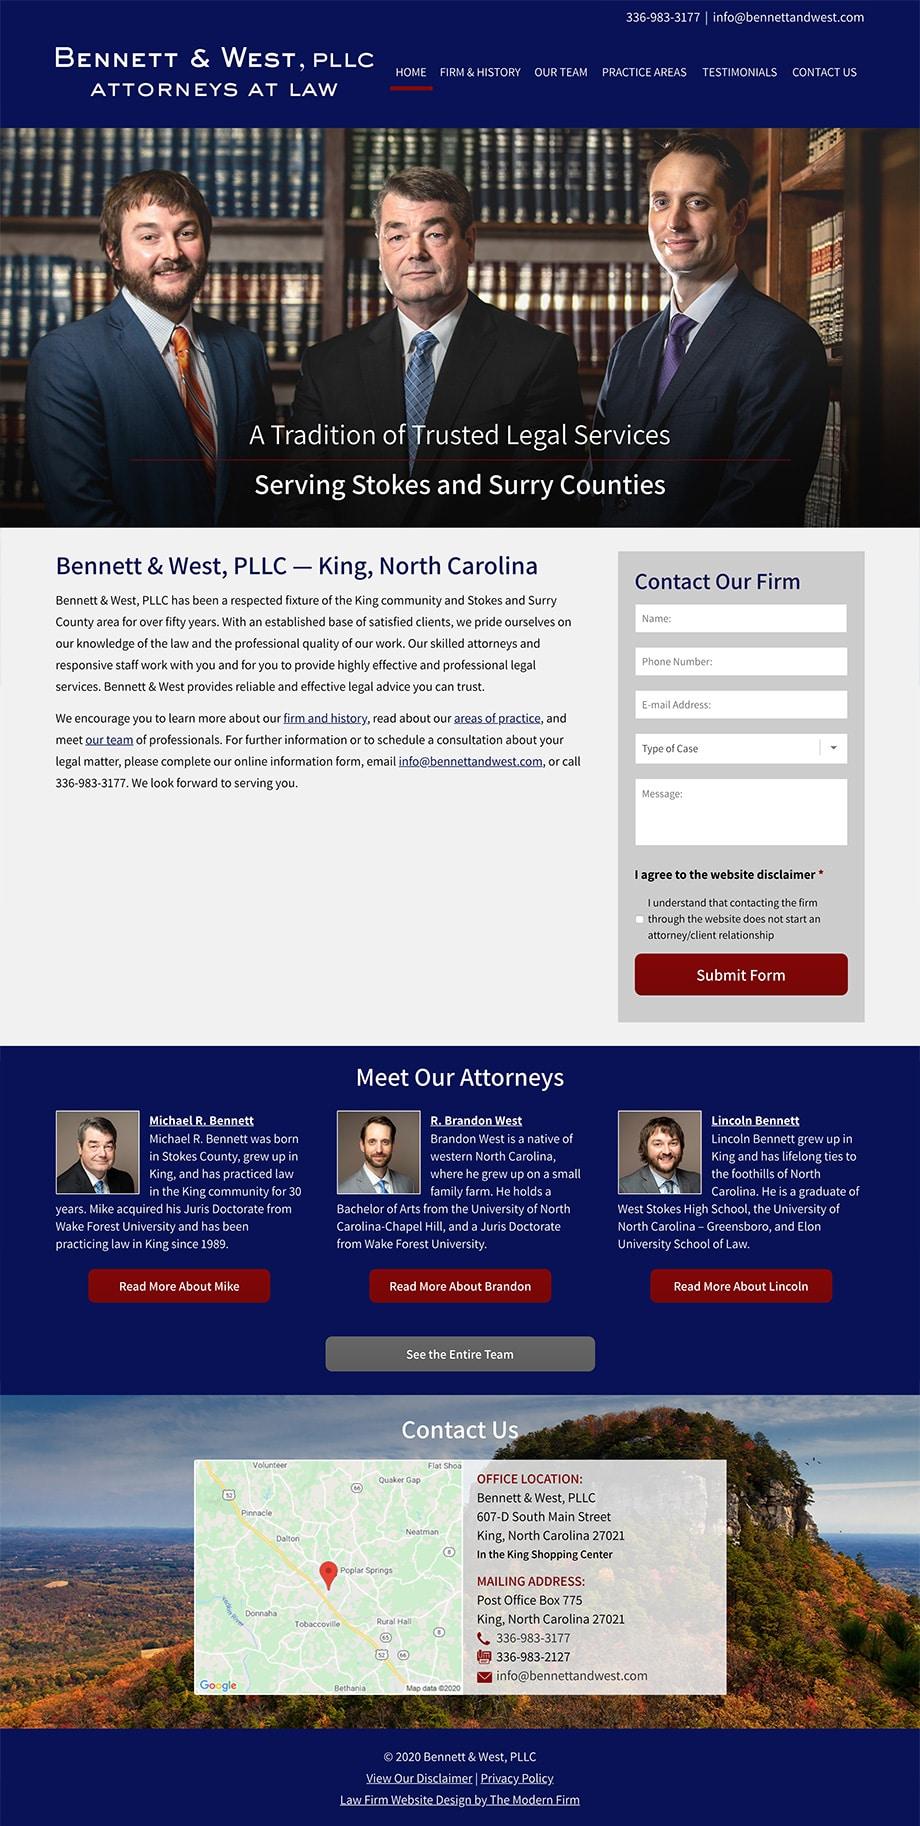 Law Firm Website Design for Bennett & West, PLLC